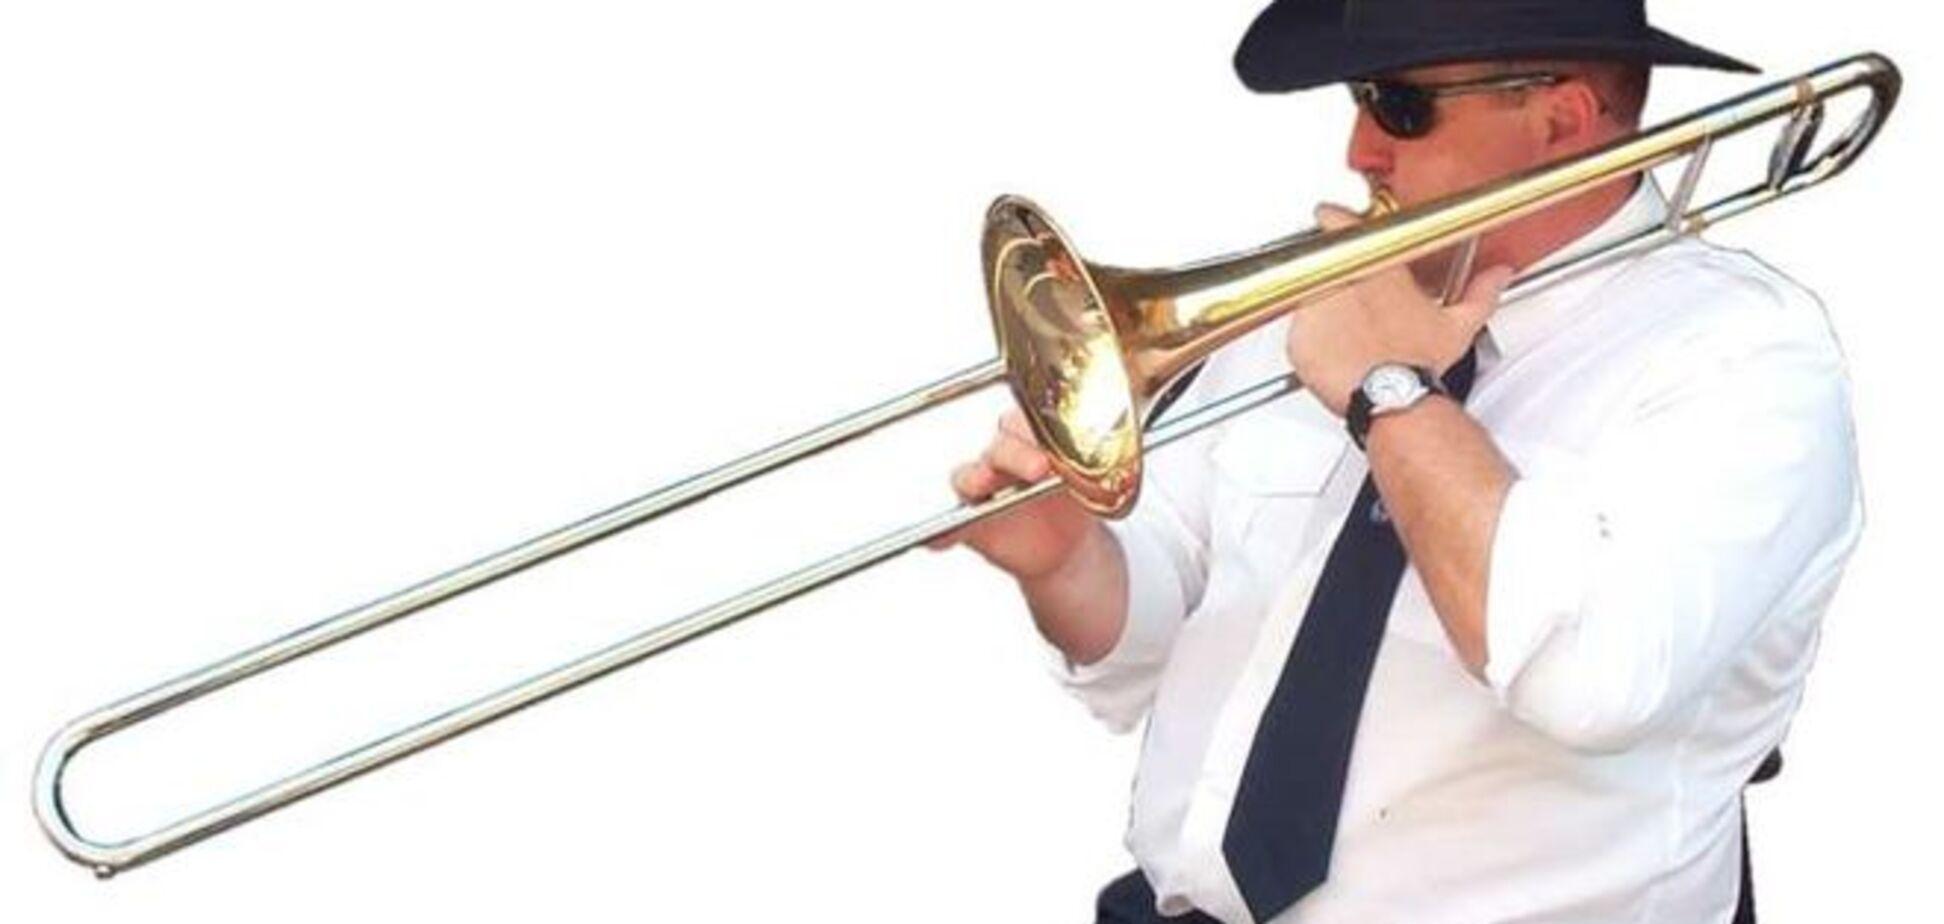 Музыкант нарушил гармонию концерта громким чихом... в тромбон: опубликовано видео